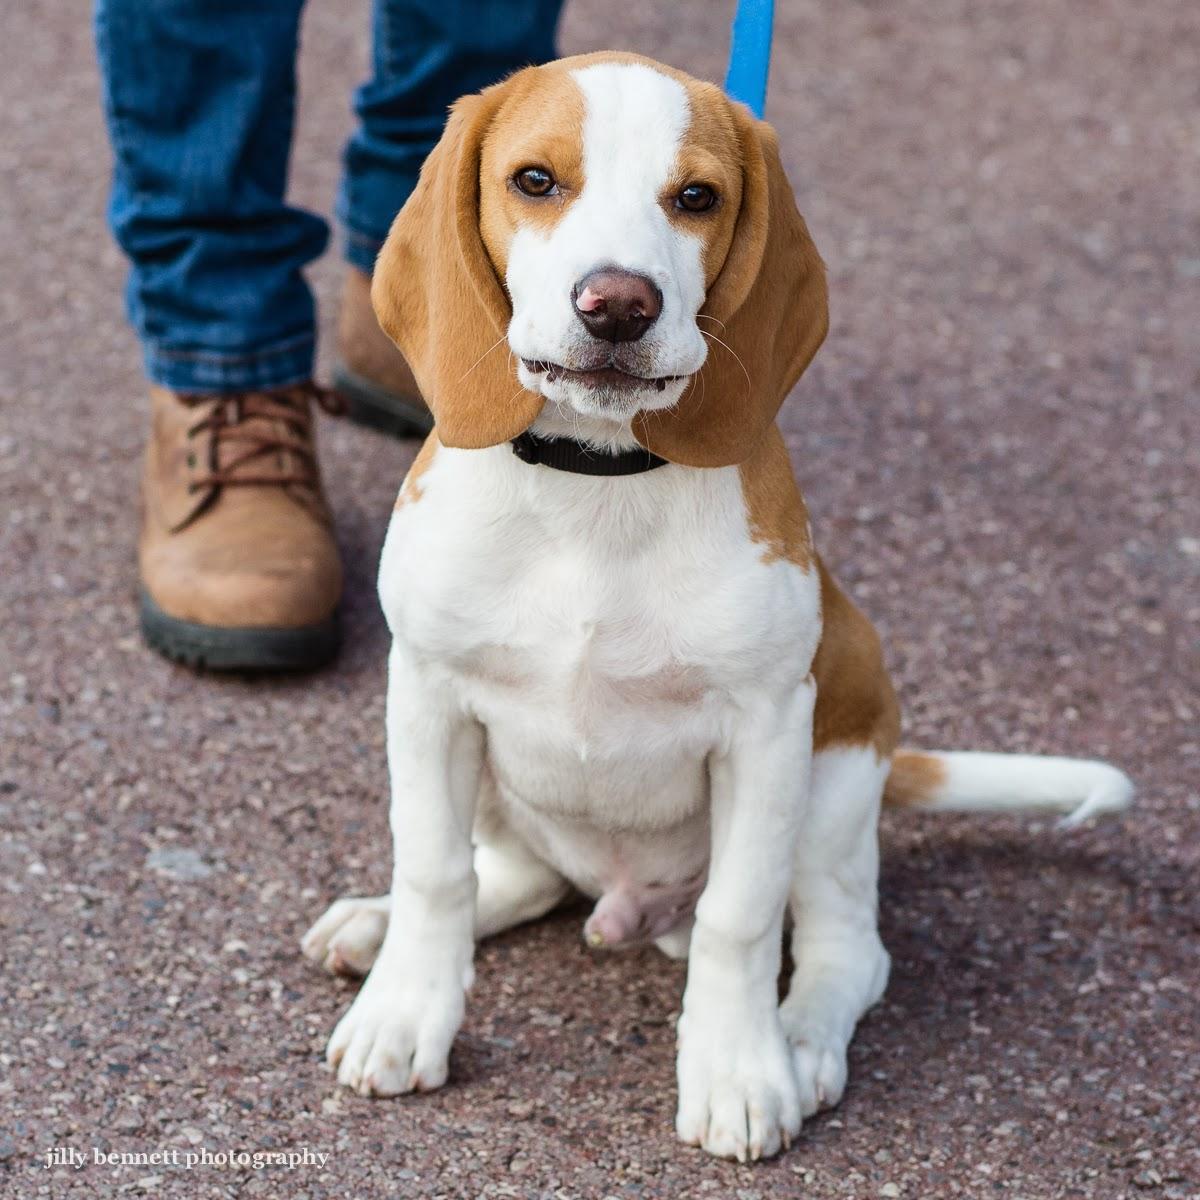 ️. It's a baby Squishy Lemon Beagle!!!!!!! | Cute beagles ...  |Lemon Beagle Puppies